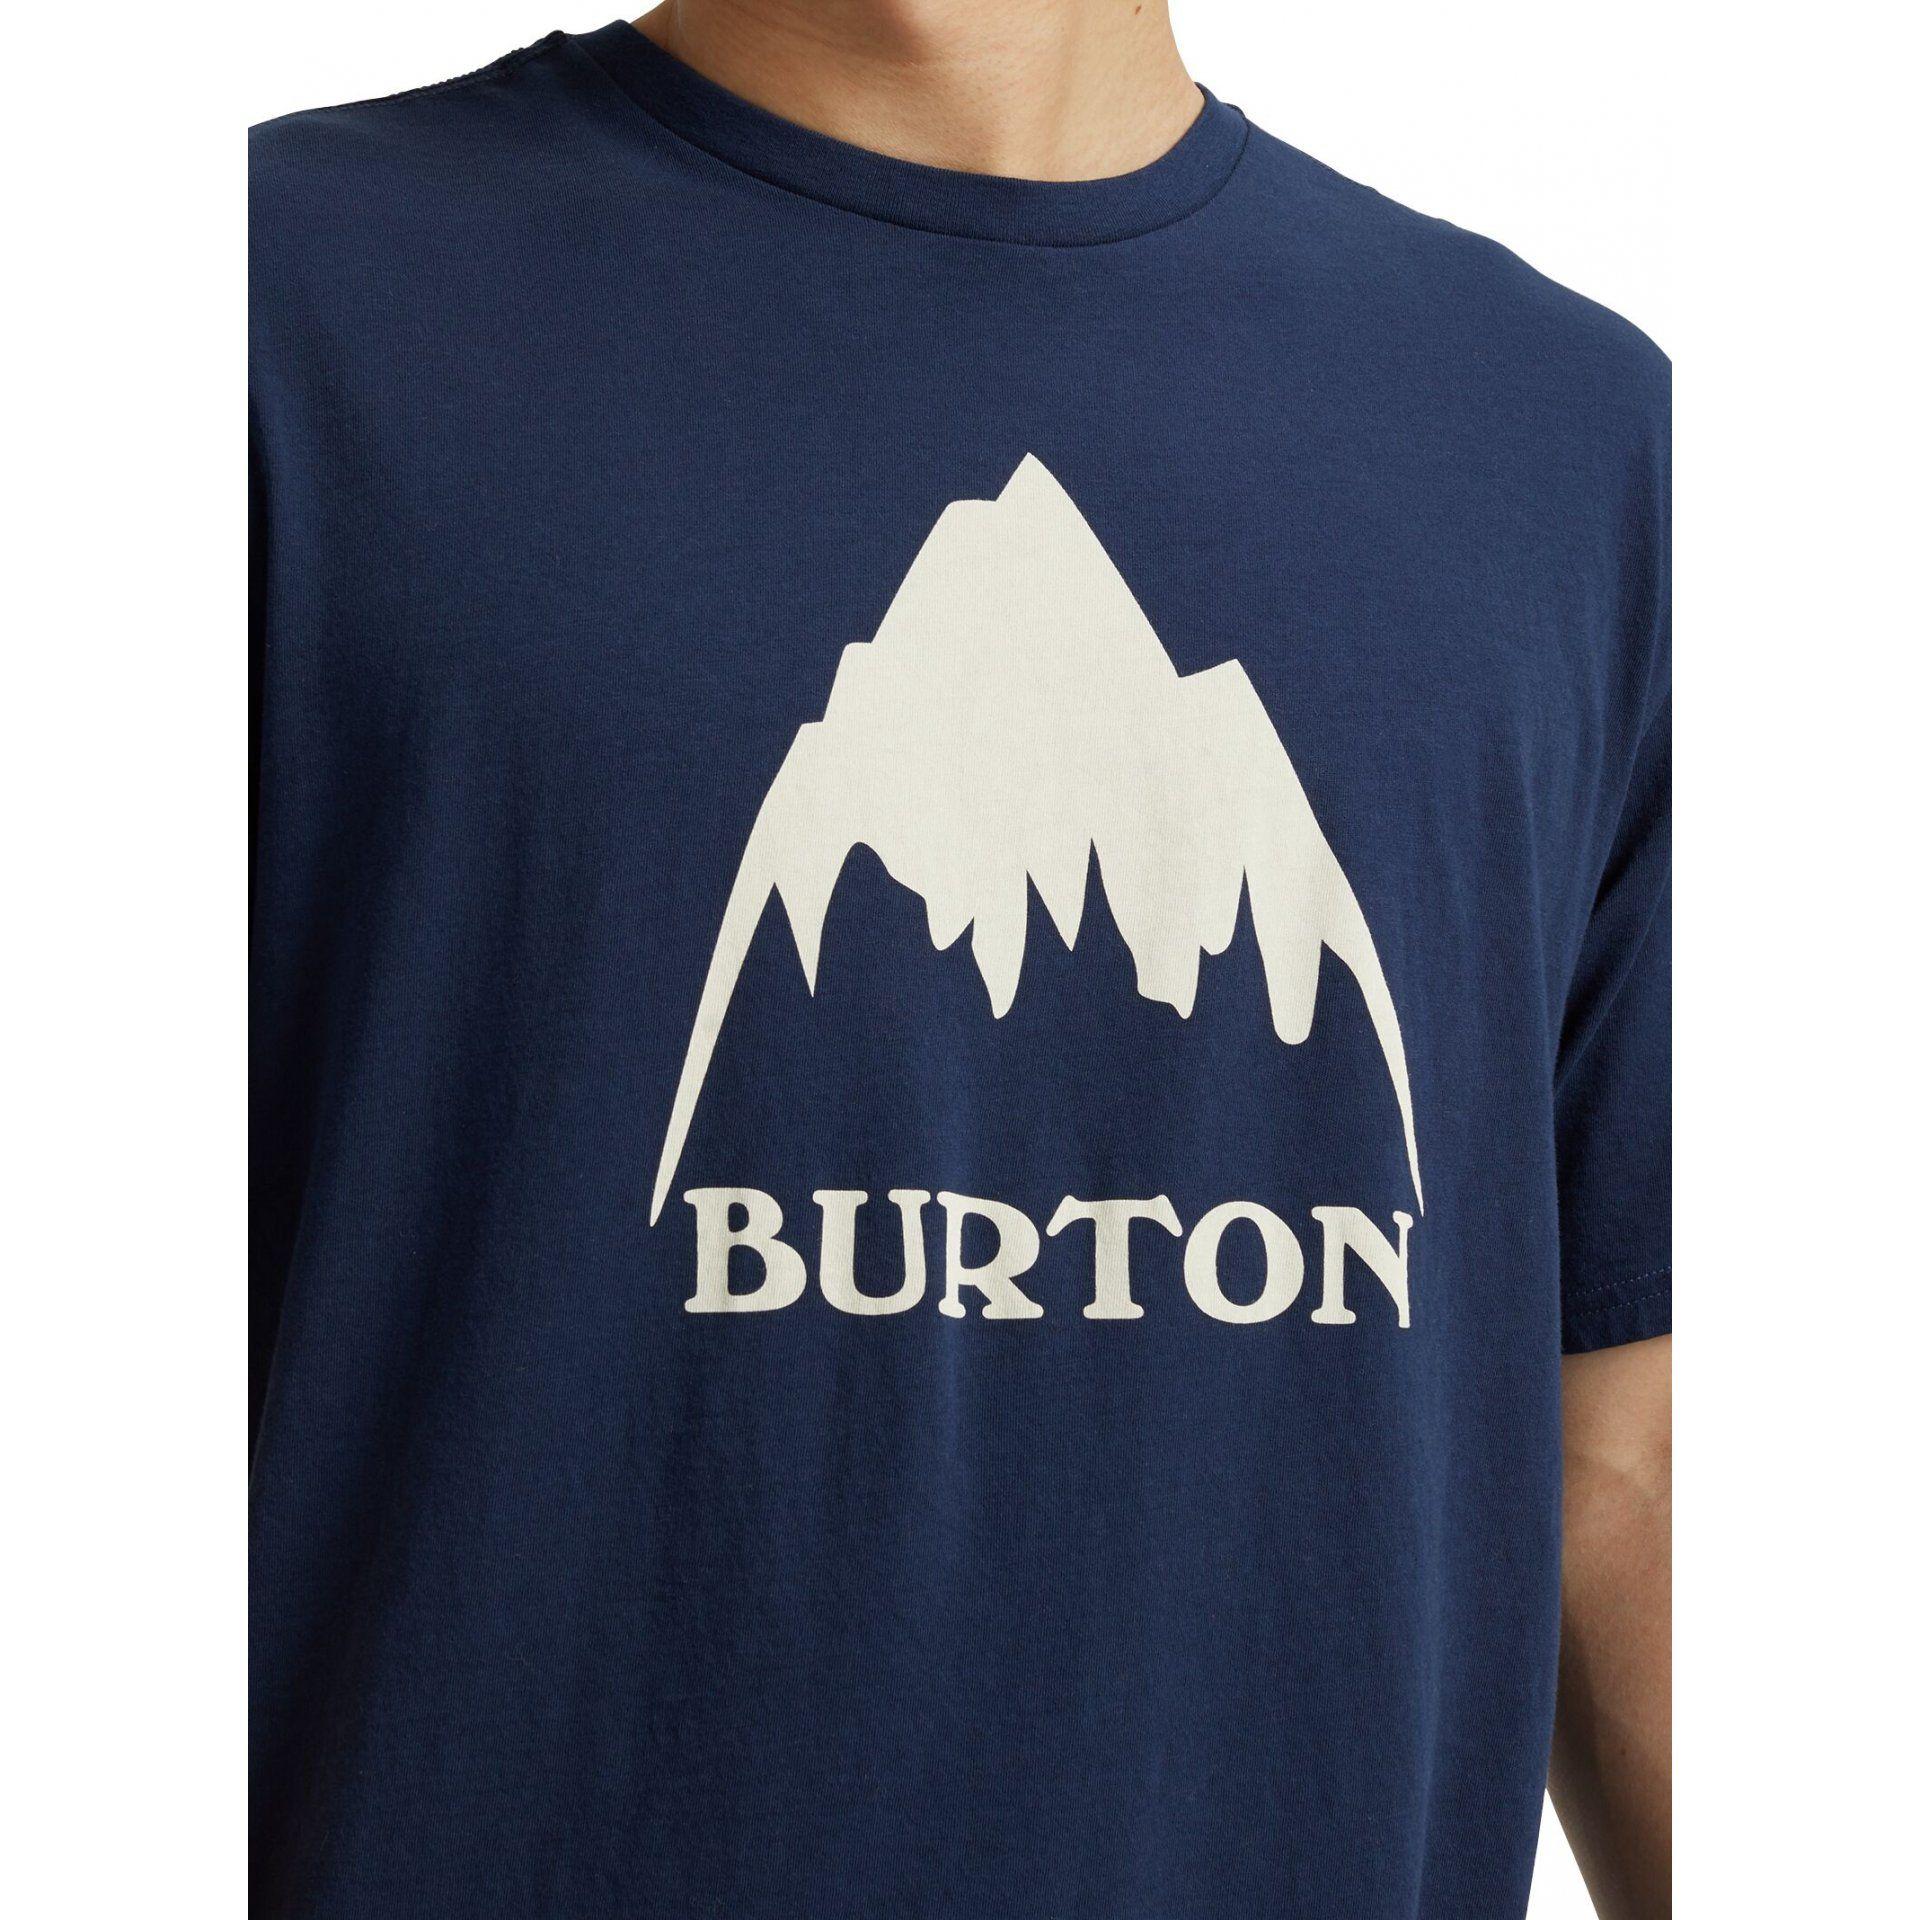 KOSZULKA BURTON CLASSIC MOUNTAIN HIGH DRESS BLUE DETALE